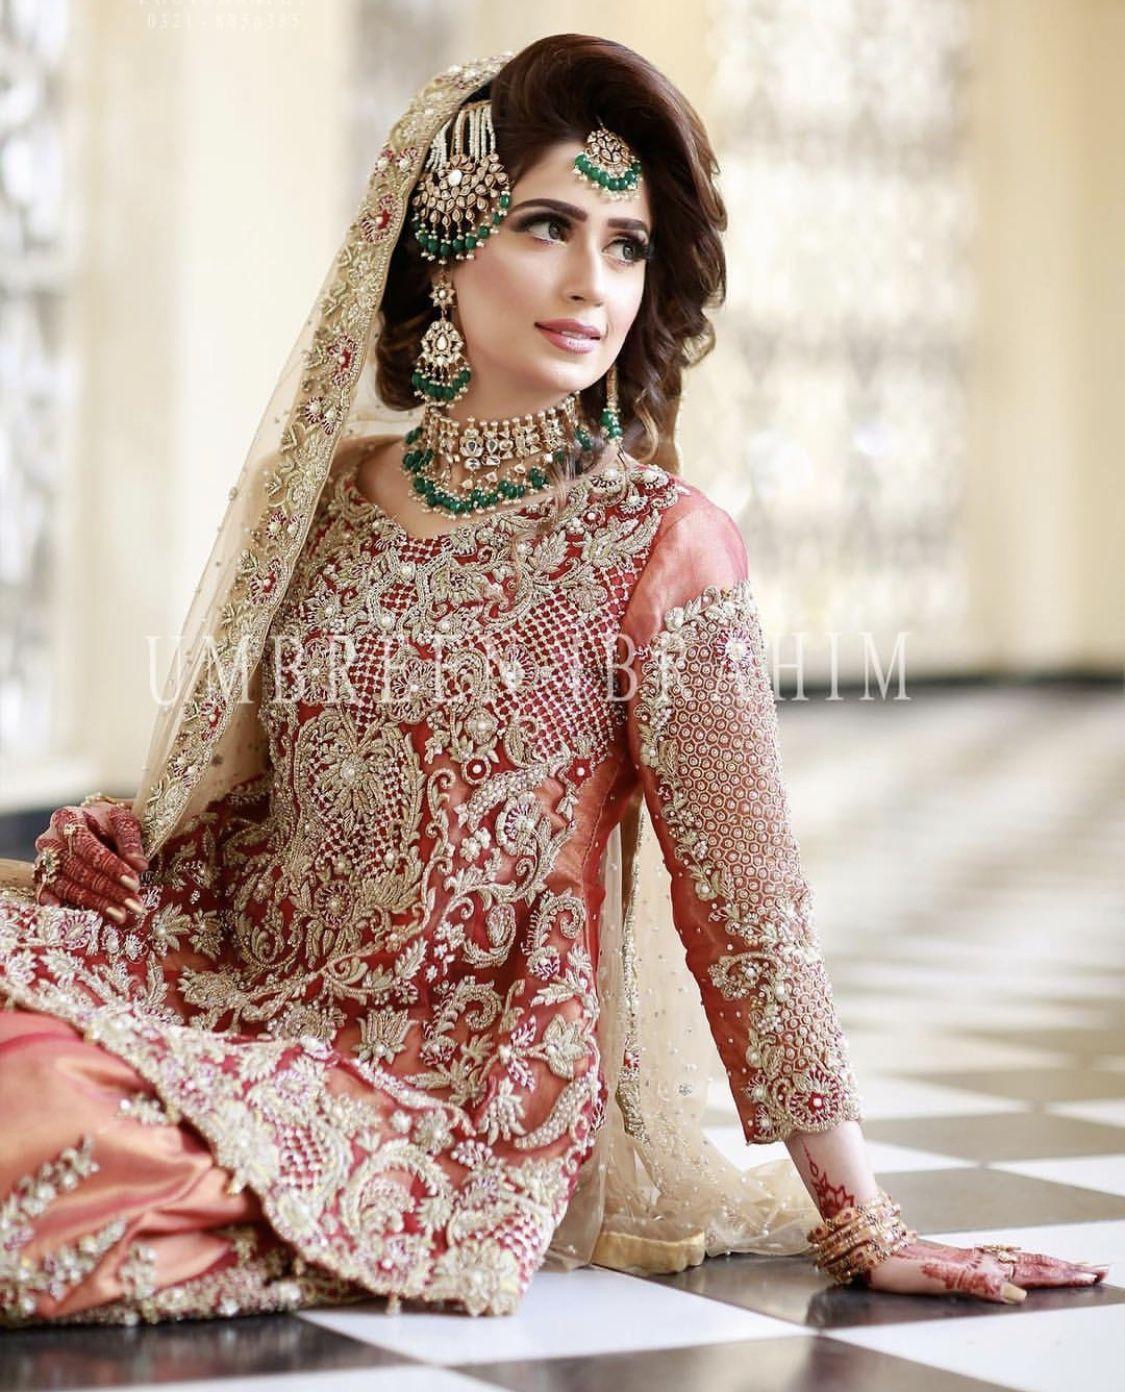 Pin By Nayab Musa On Wedding Inspirations